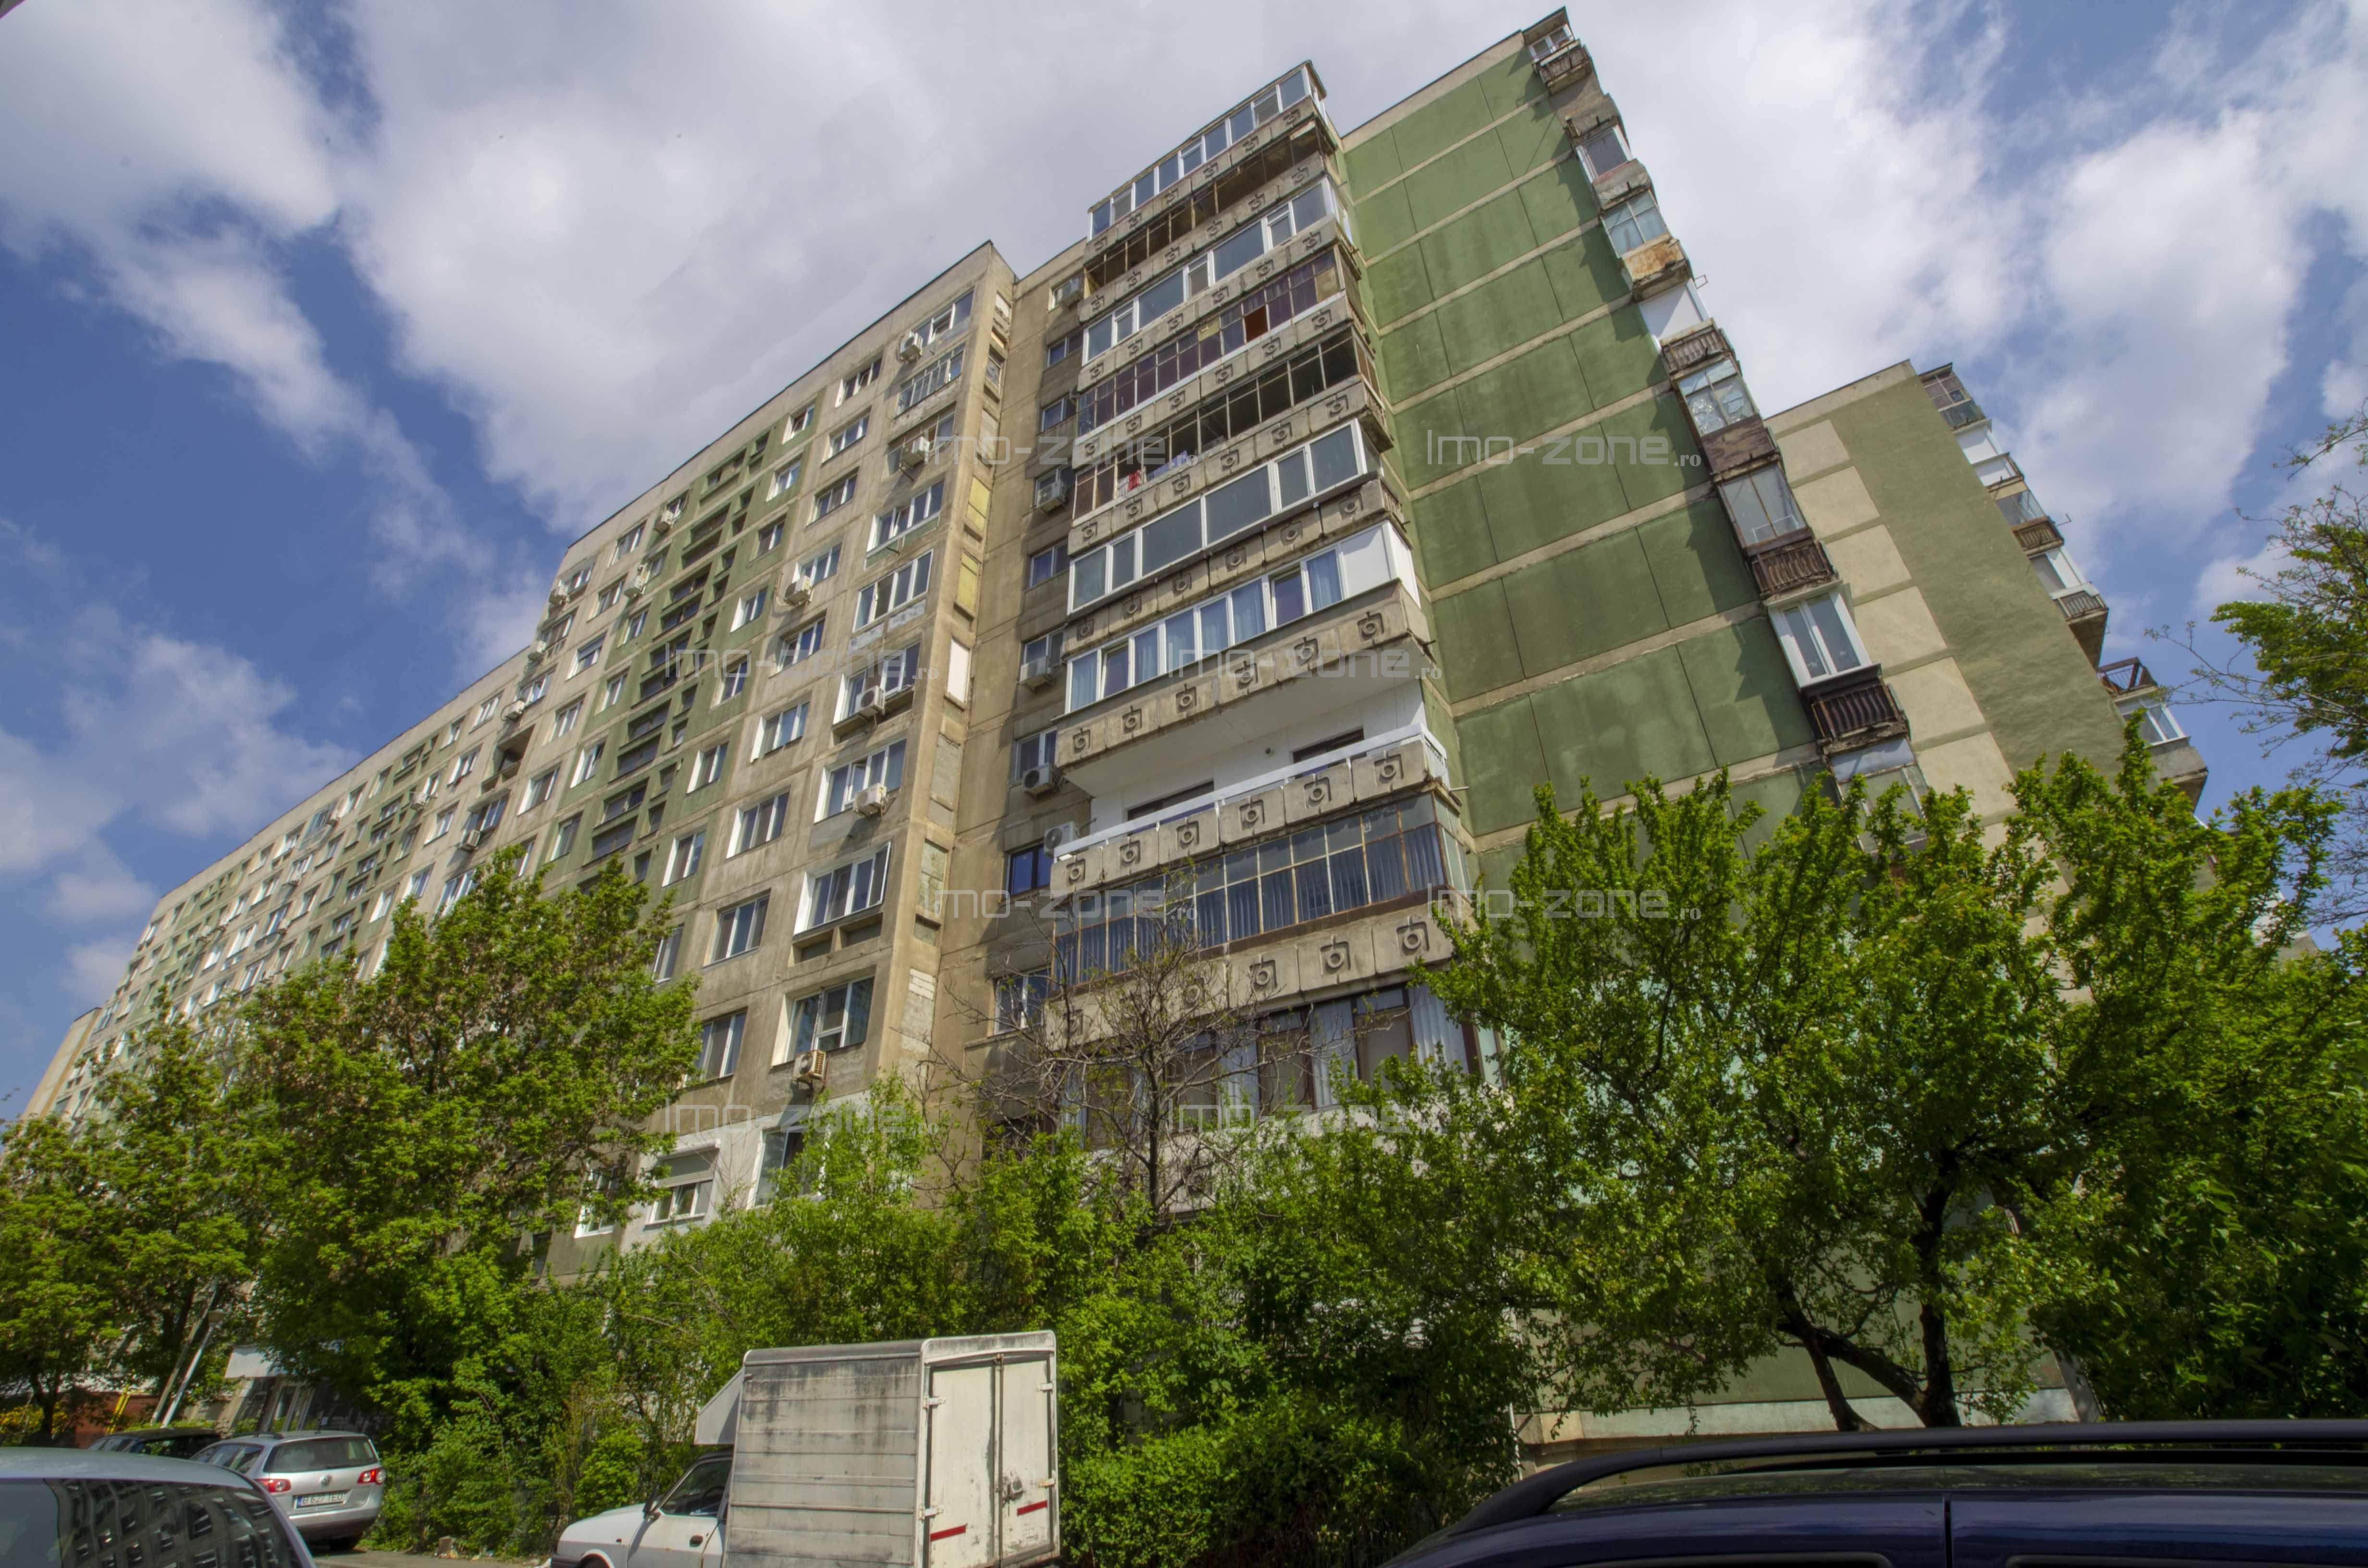 Apartament 2 camere Militari - Metrou Pacii - Autogara Militari, 52 mp, renovat